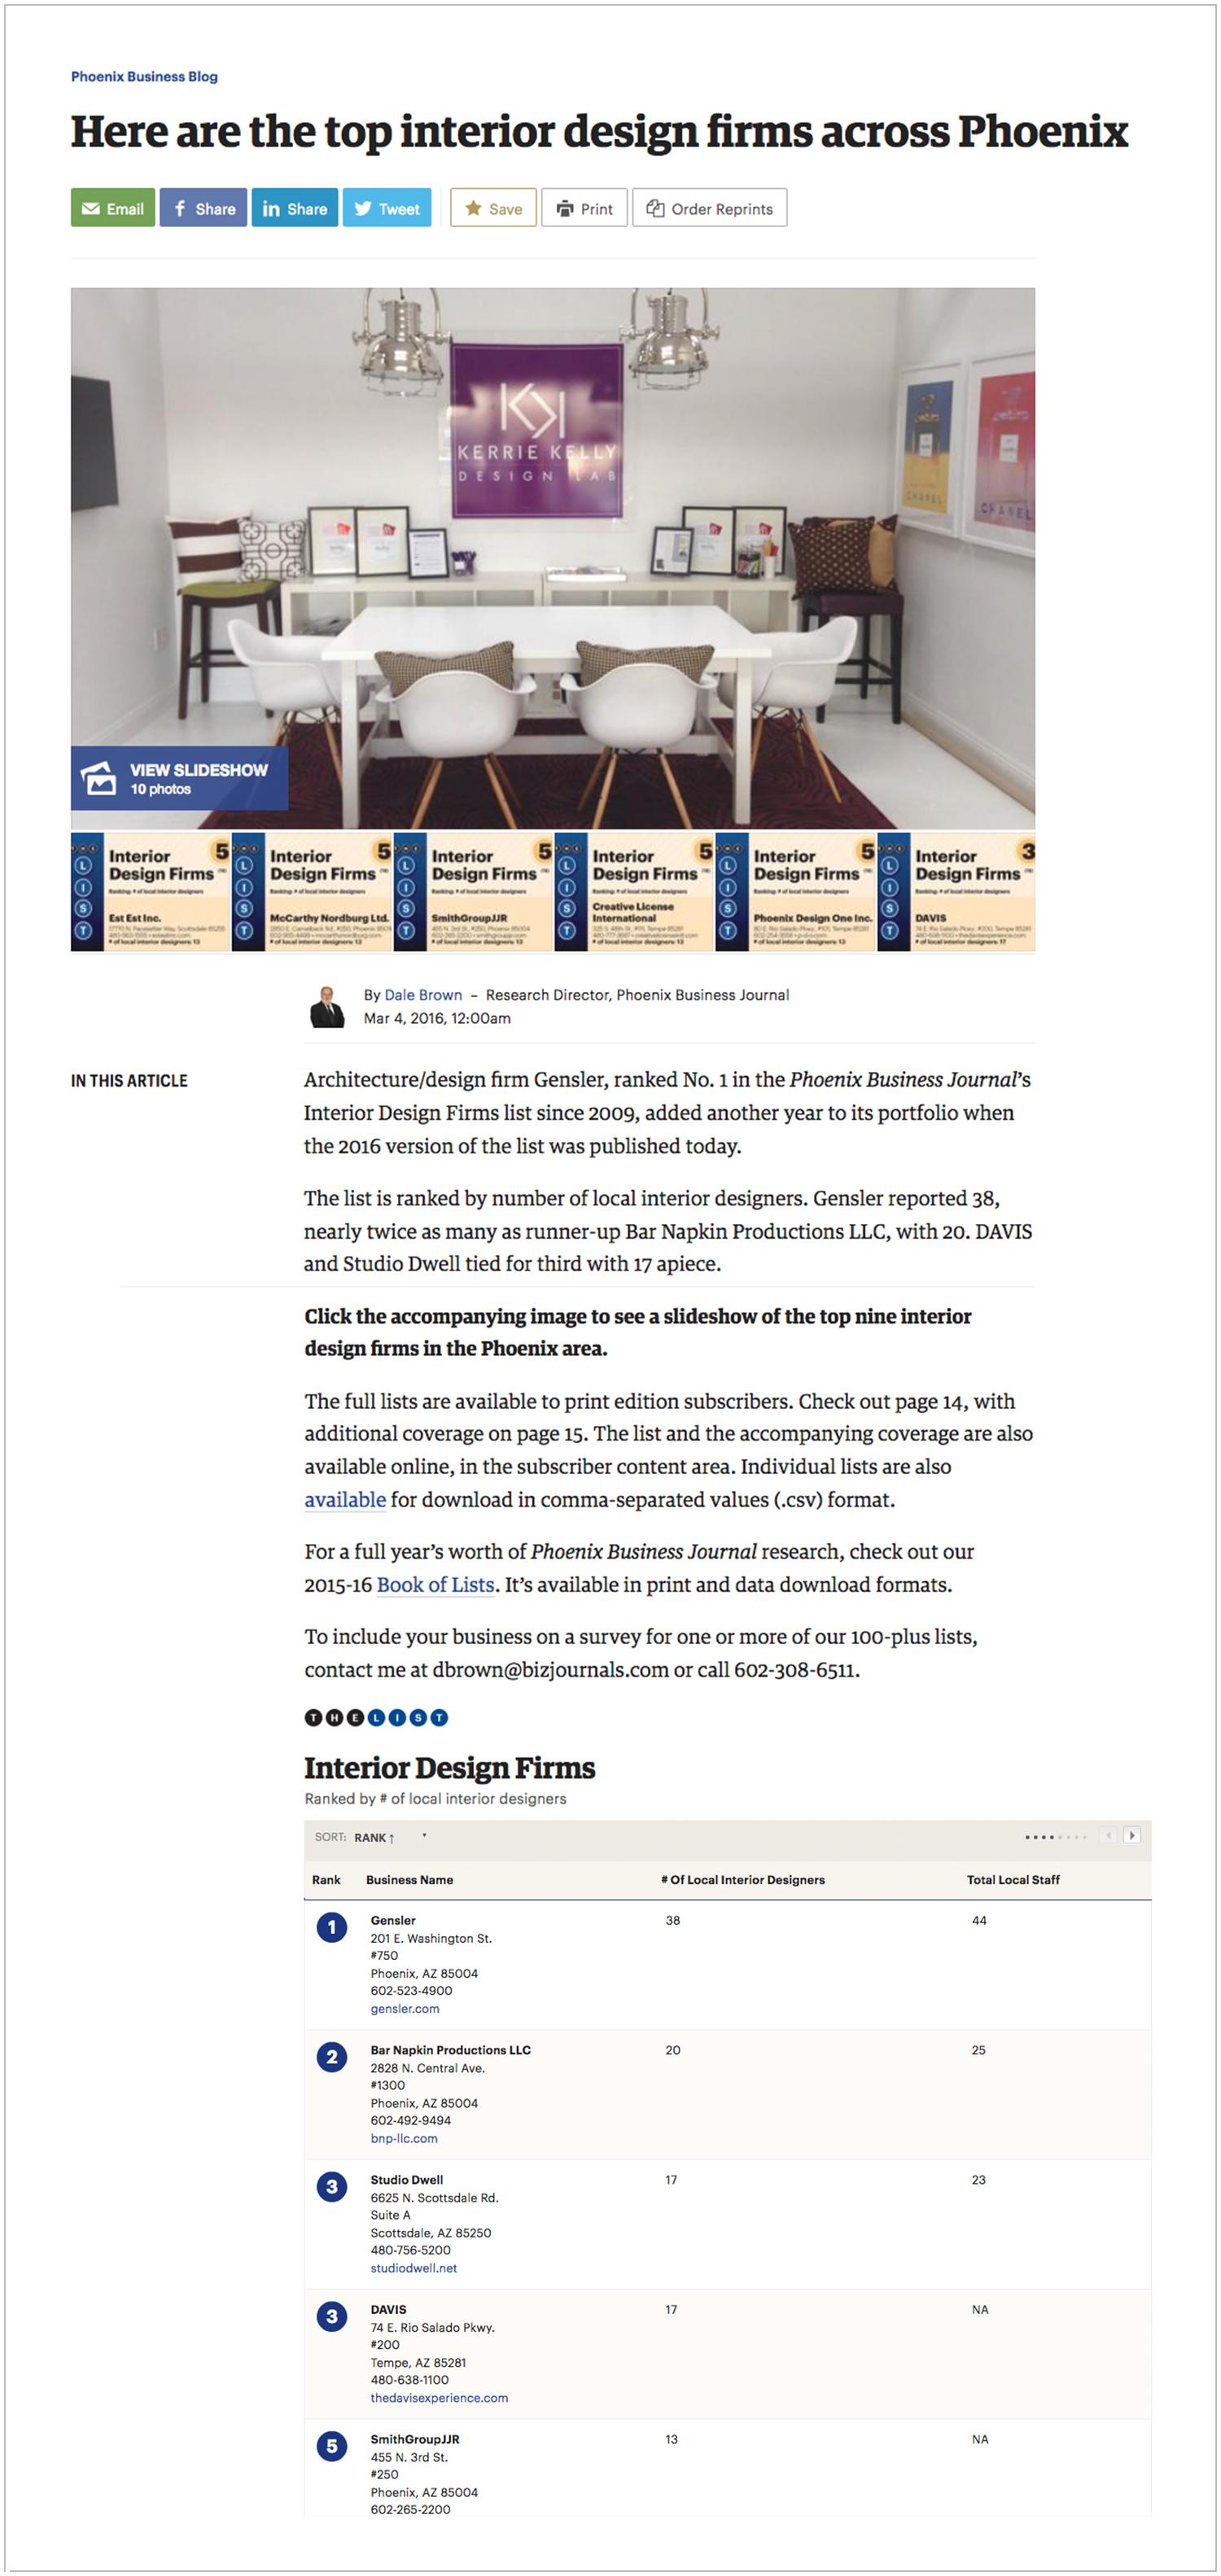 160304 Phoenix Business Journal Article.jpg